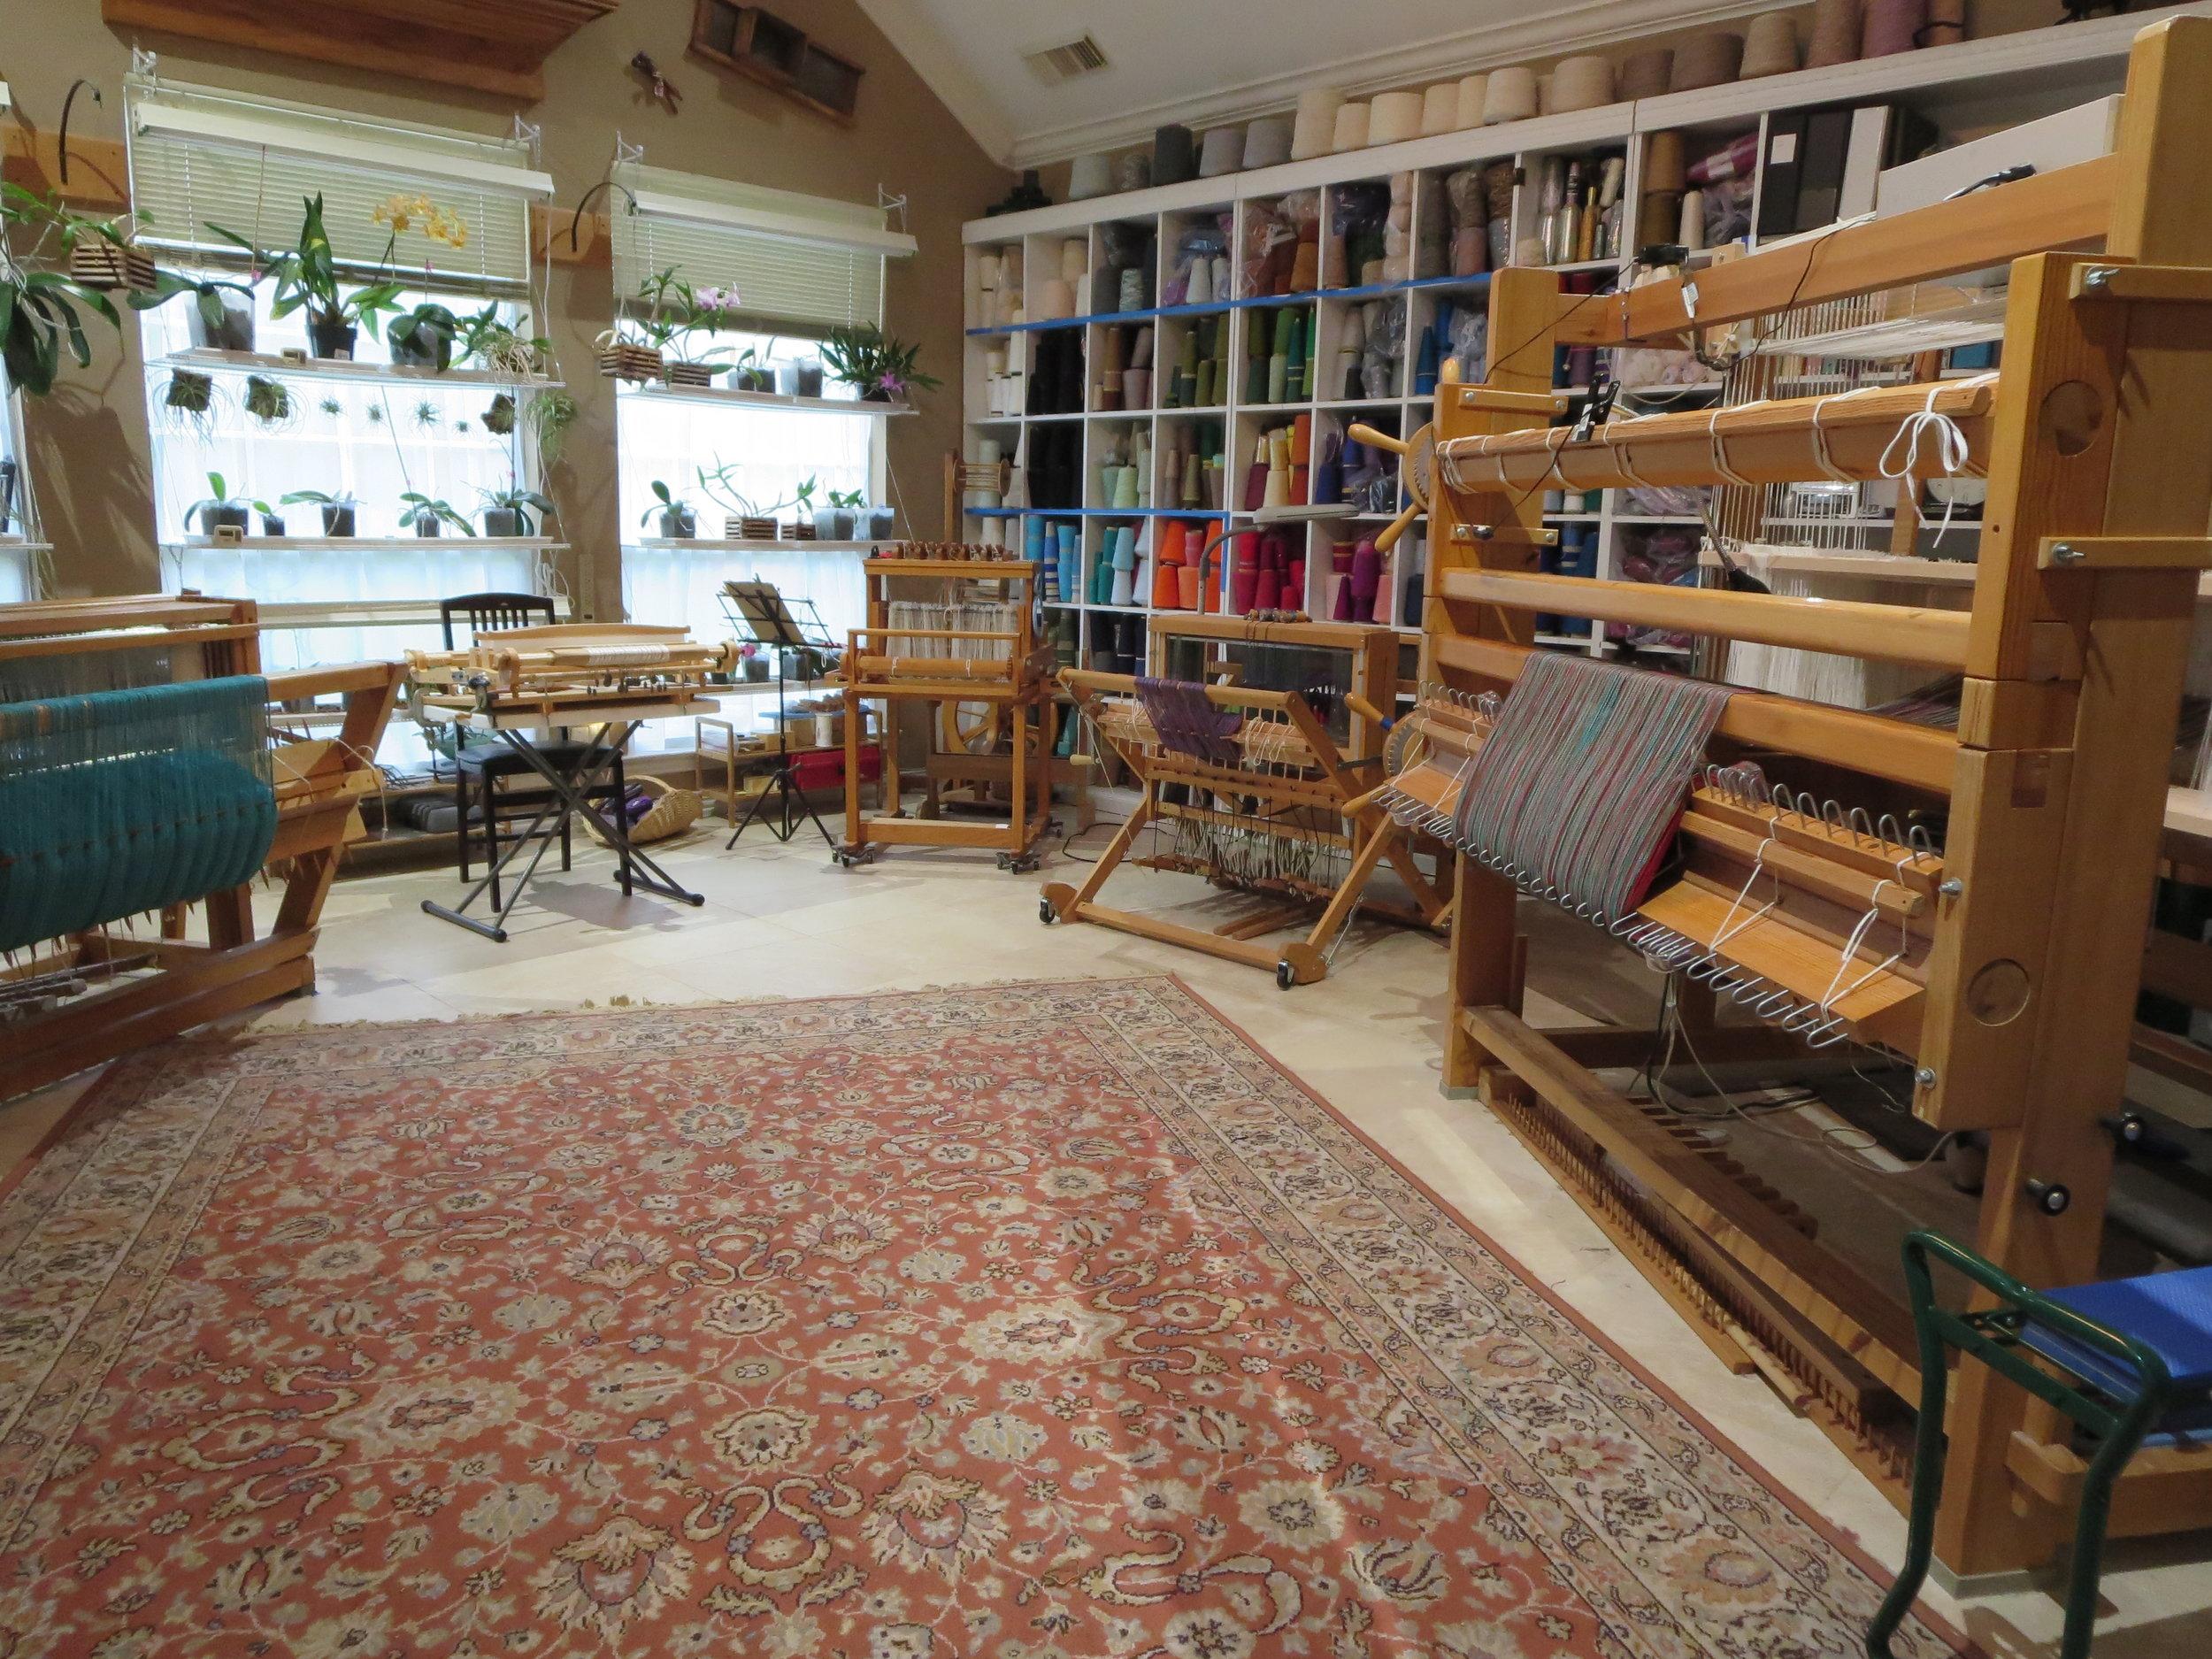 - Lake Trail Studio(817) 430-1341gloria@laketrailstudio.com